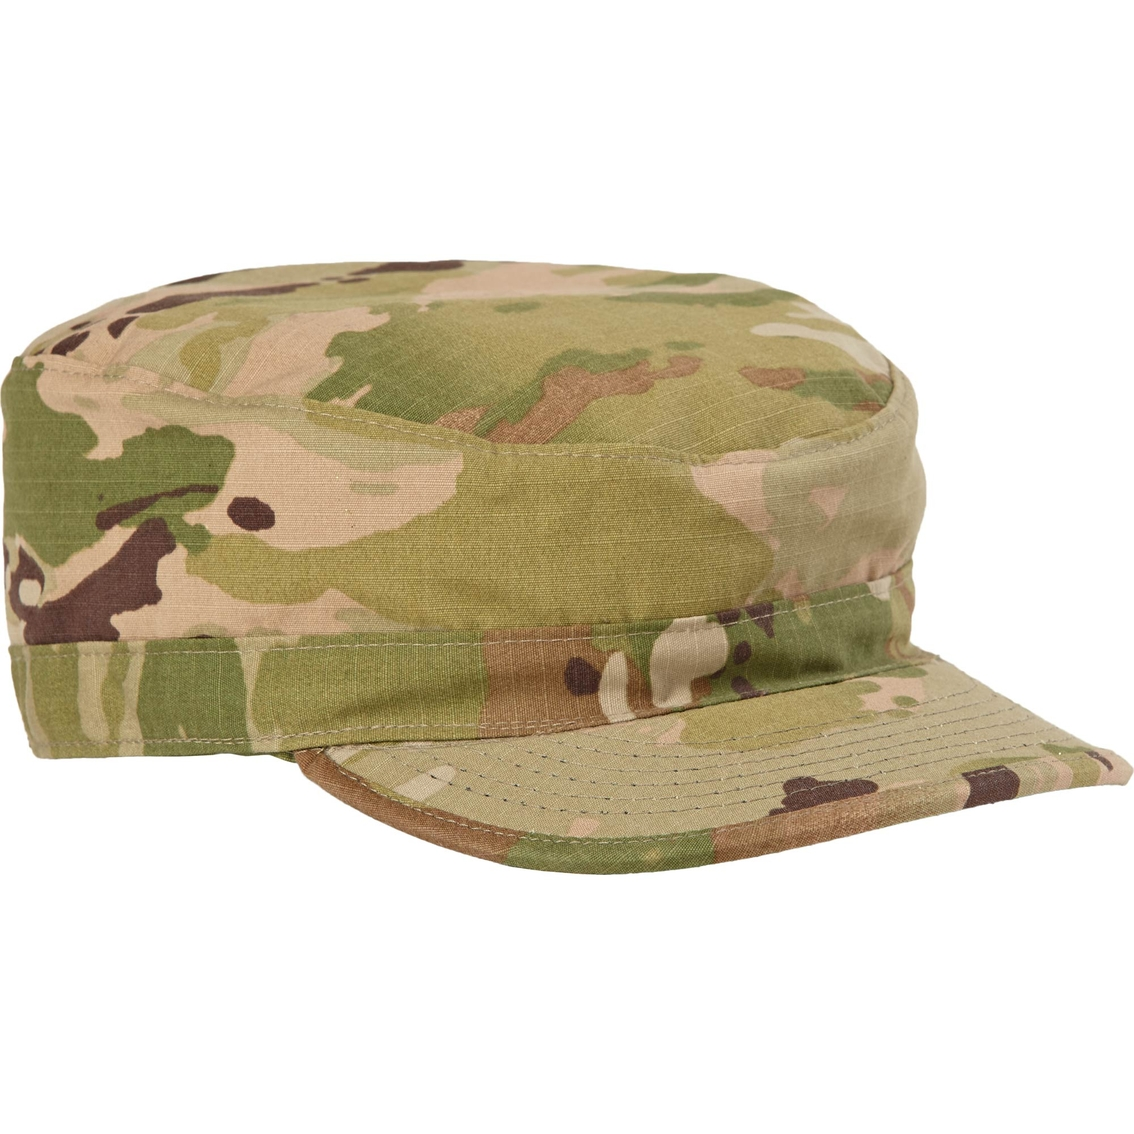 Dlats Army Patrol Cap (ocp) | Ocp-acu | Military | Shop The